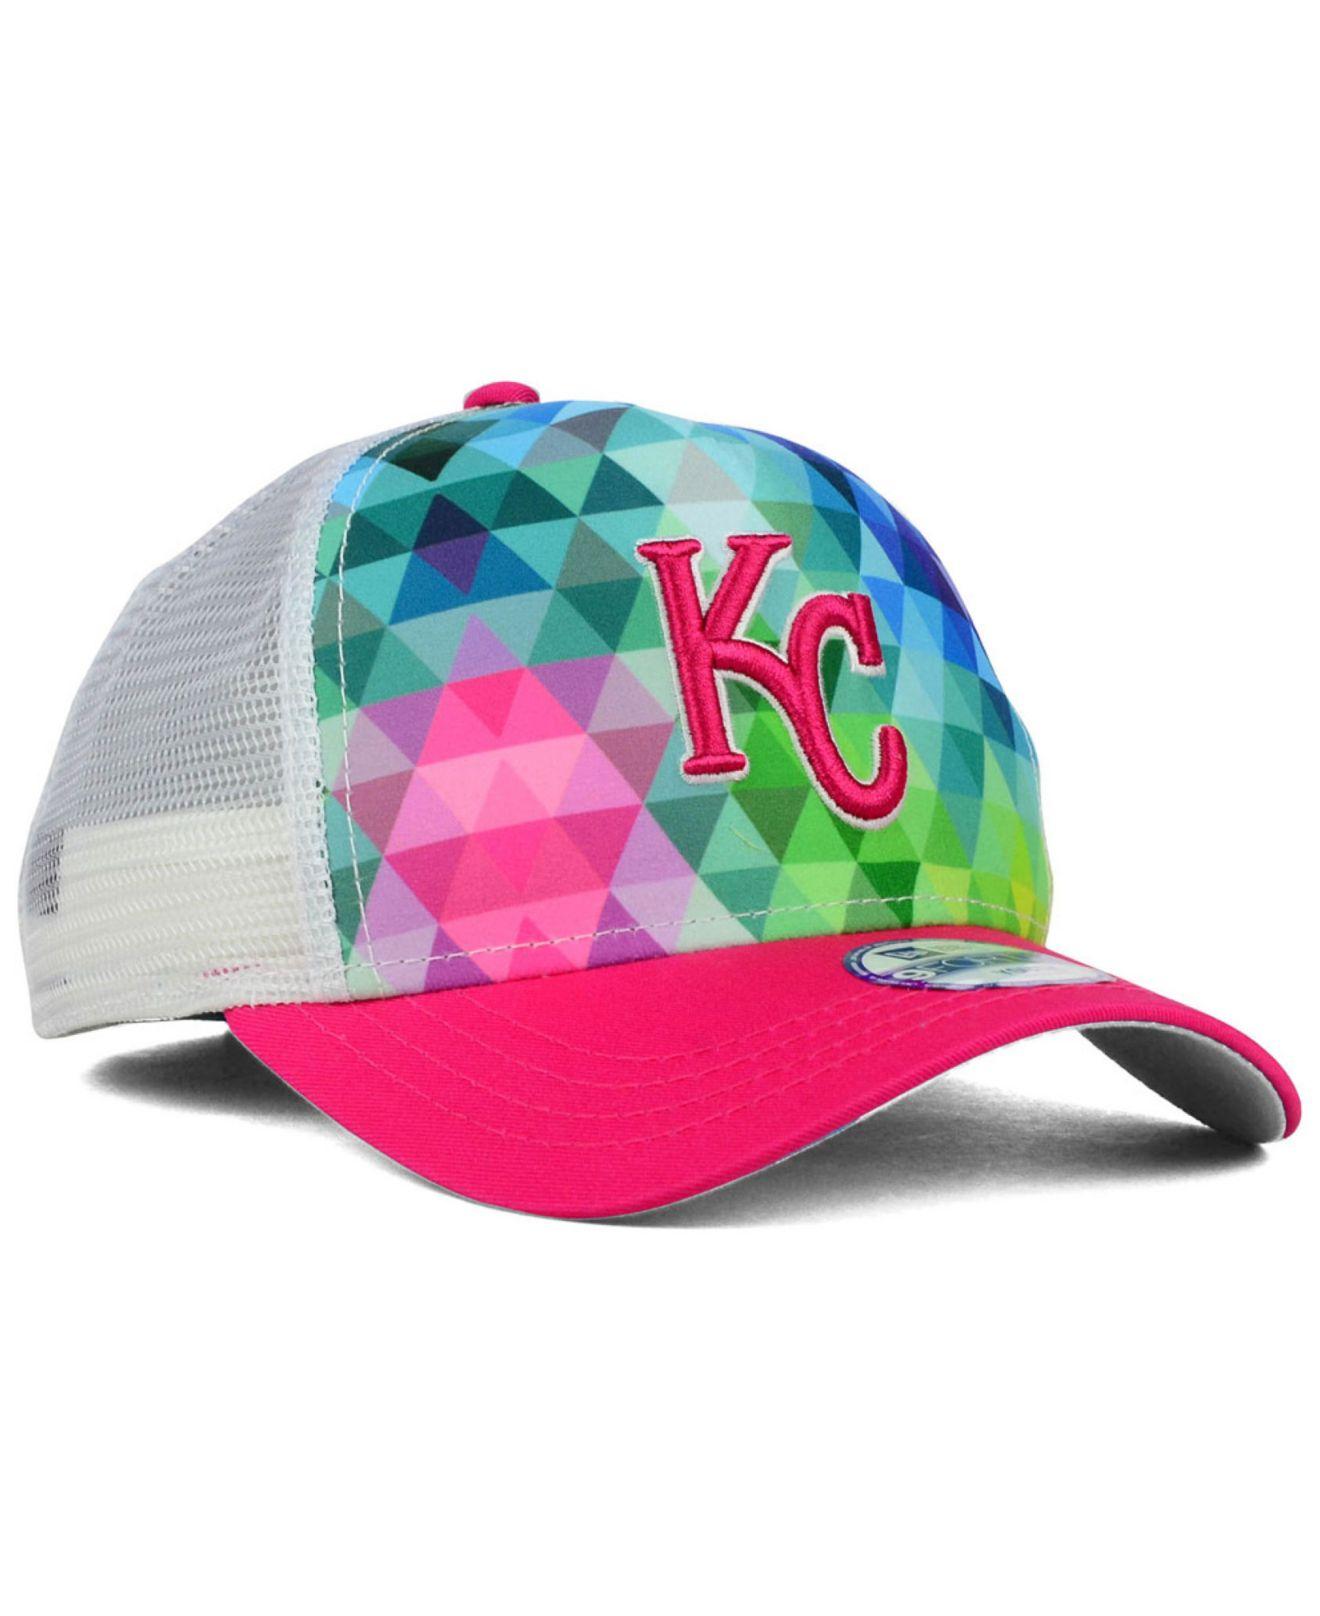 online store 5a69d 5beb9 ... hat cap adjustable kc a4b02 fd21e  sweden lyst ktz kids kansas city  royals gem trucker 9forty cap for men b821a ea0a7